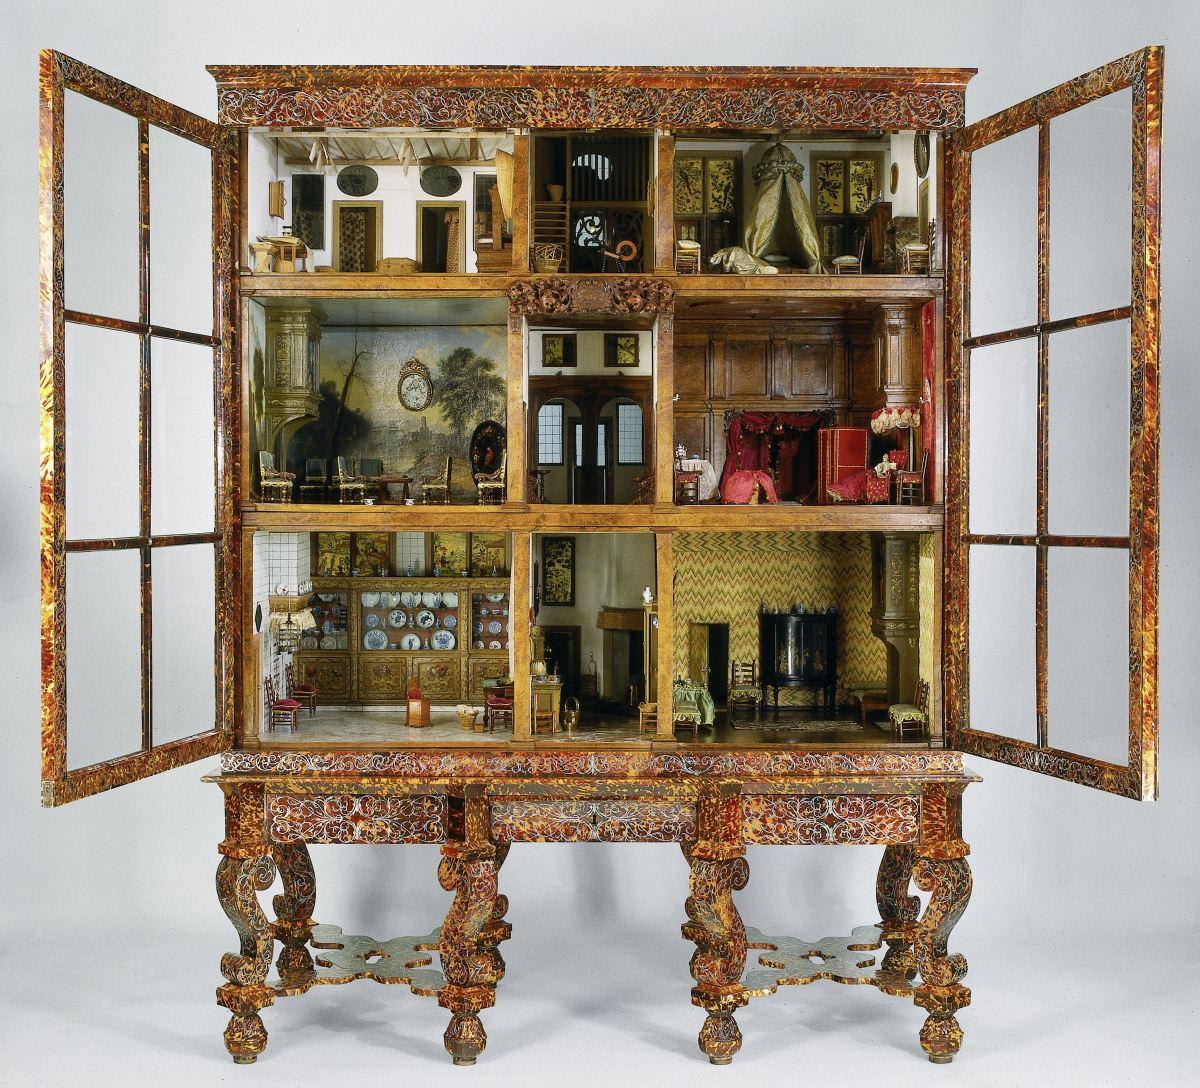 To κουκλόσπιτο της Πετρονέλα Όρτμαν στο Rijksmuseum